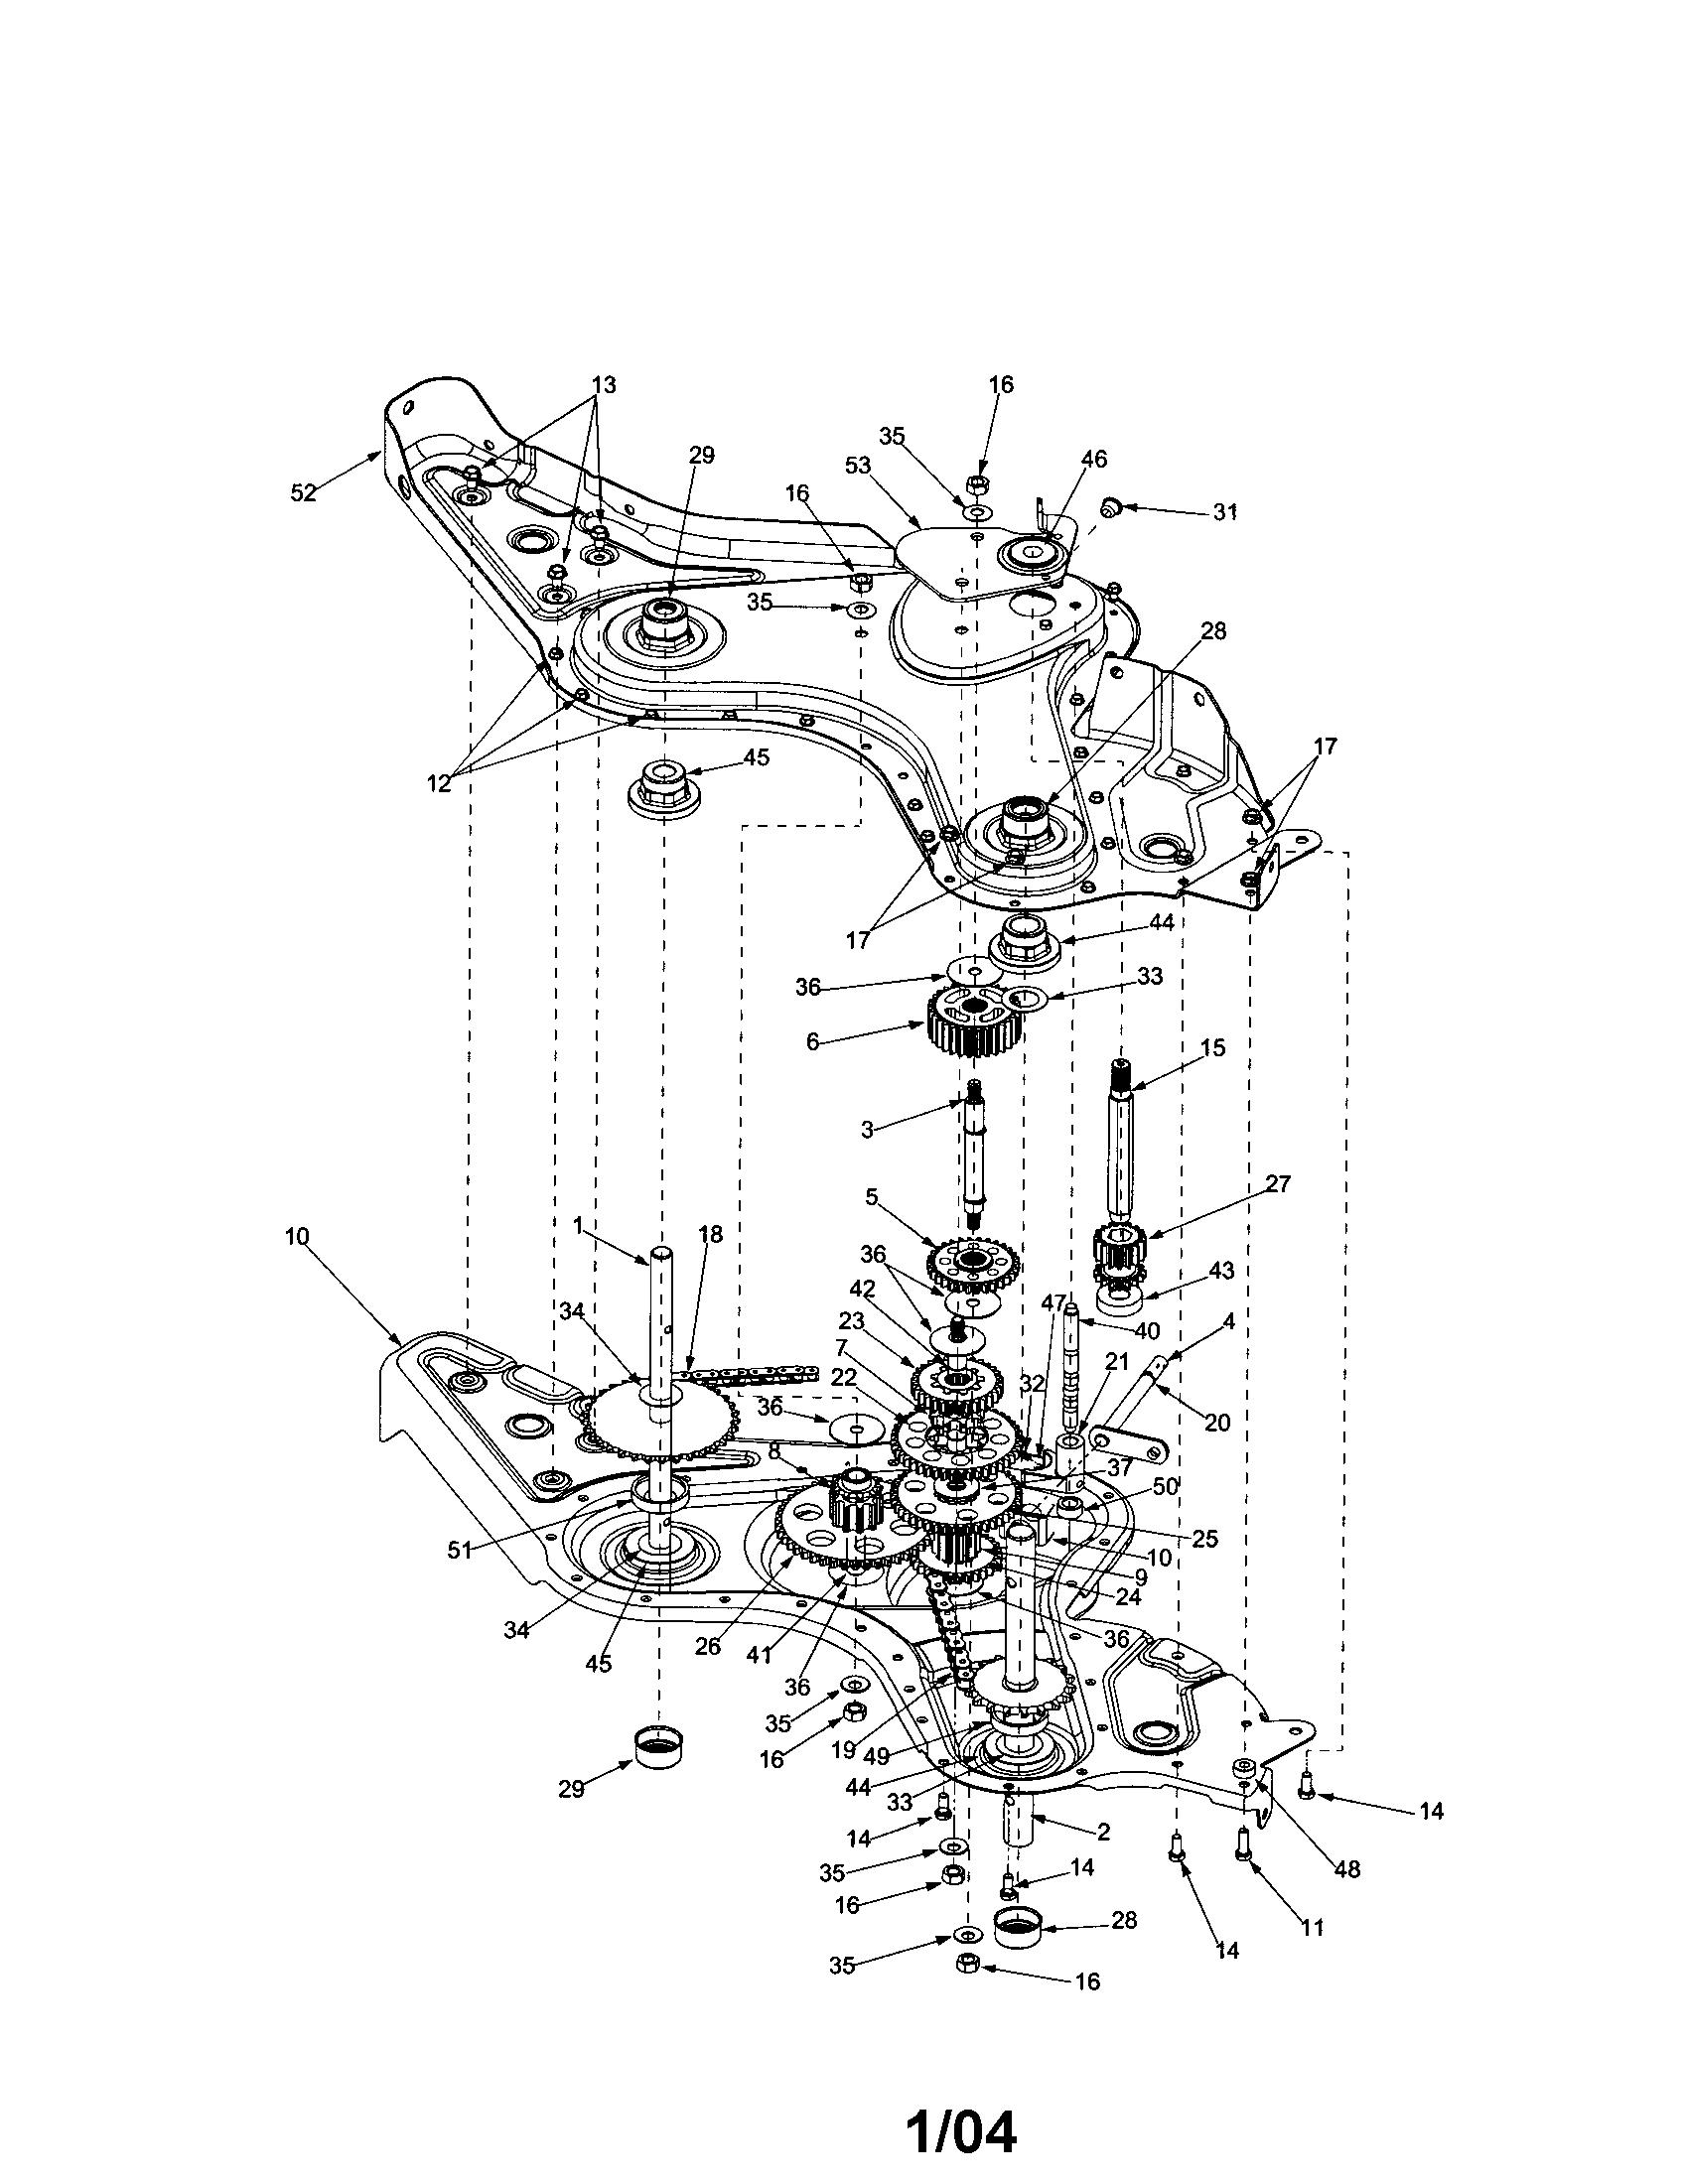 mtd rear tine tiller diagram mtd rear tine tiller wheel shaft tine shaft parts [ 1696 x 2200 Pixel ]